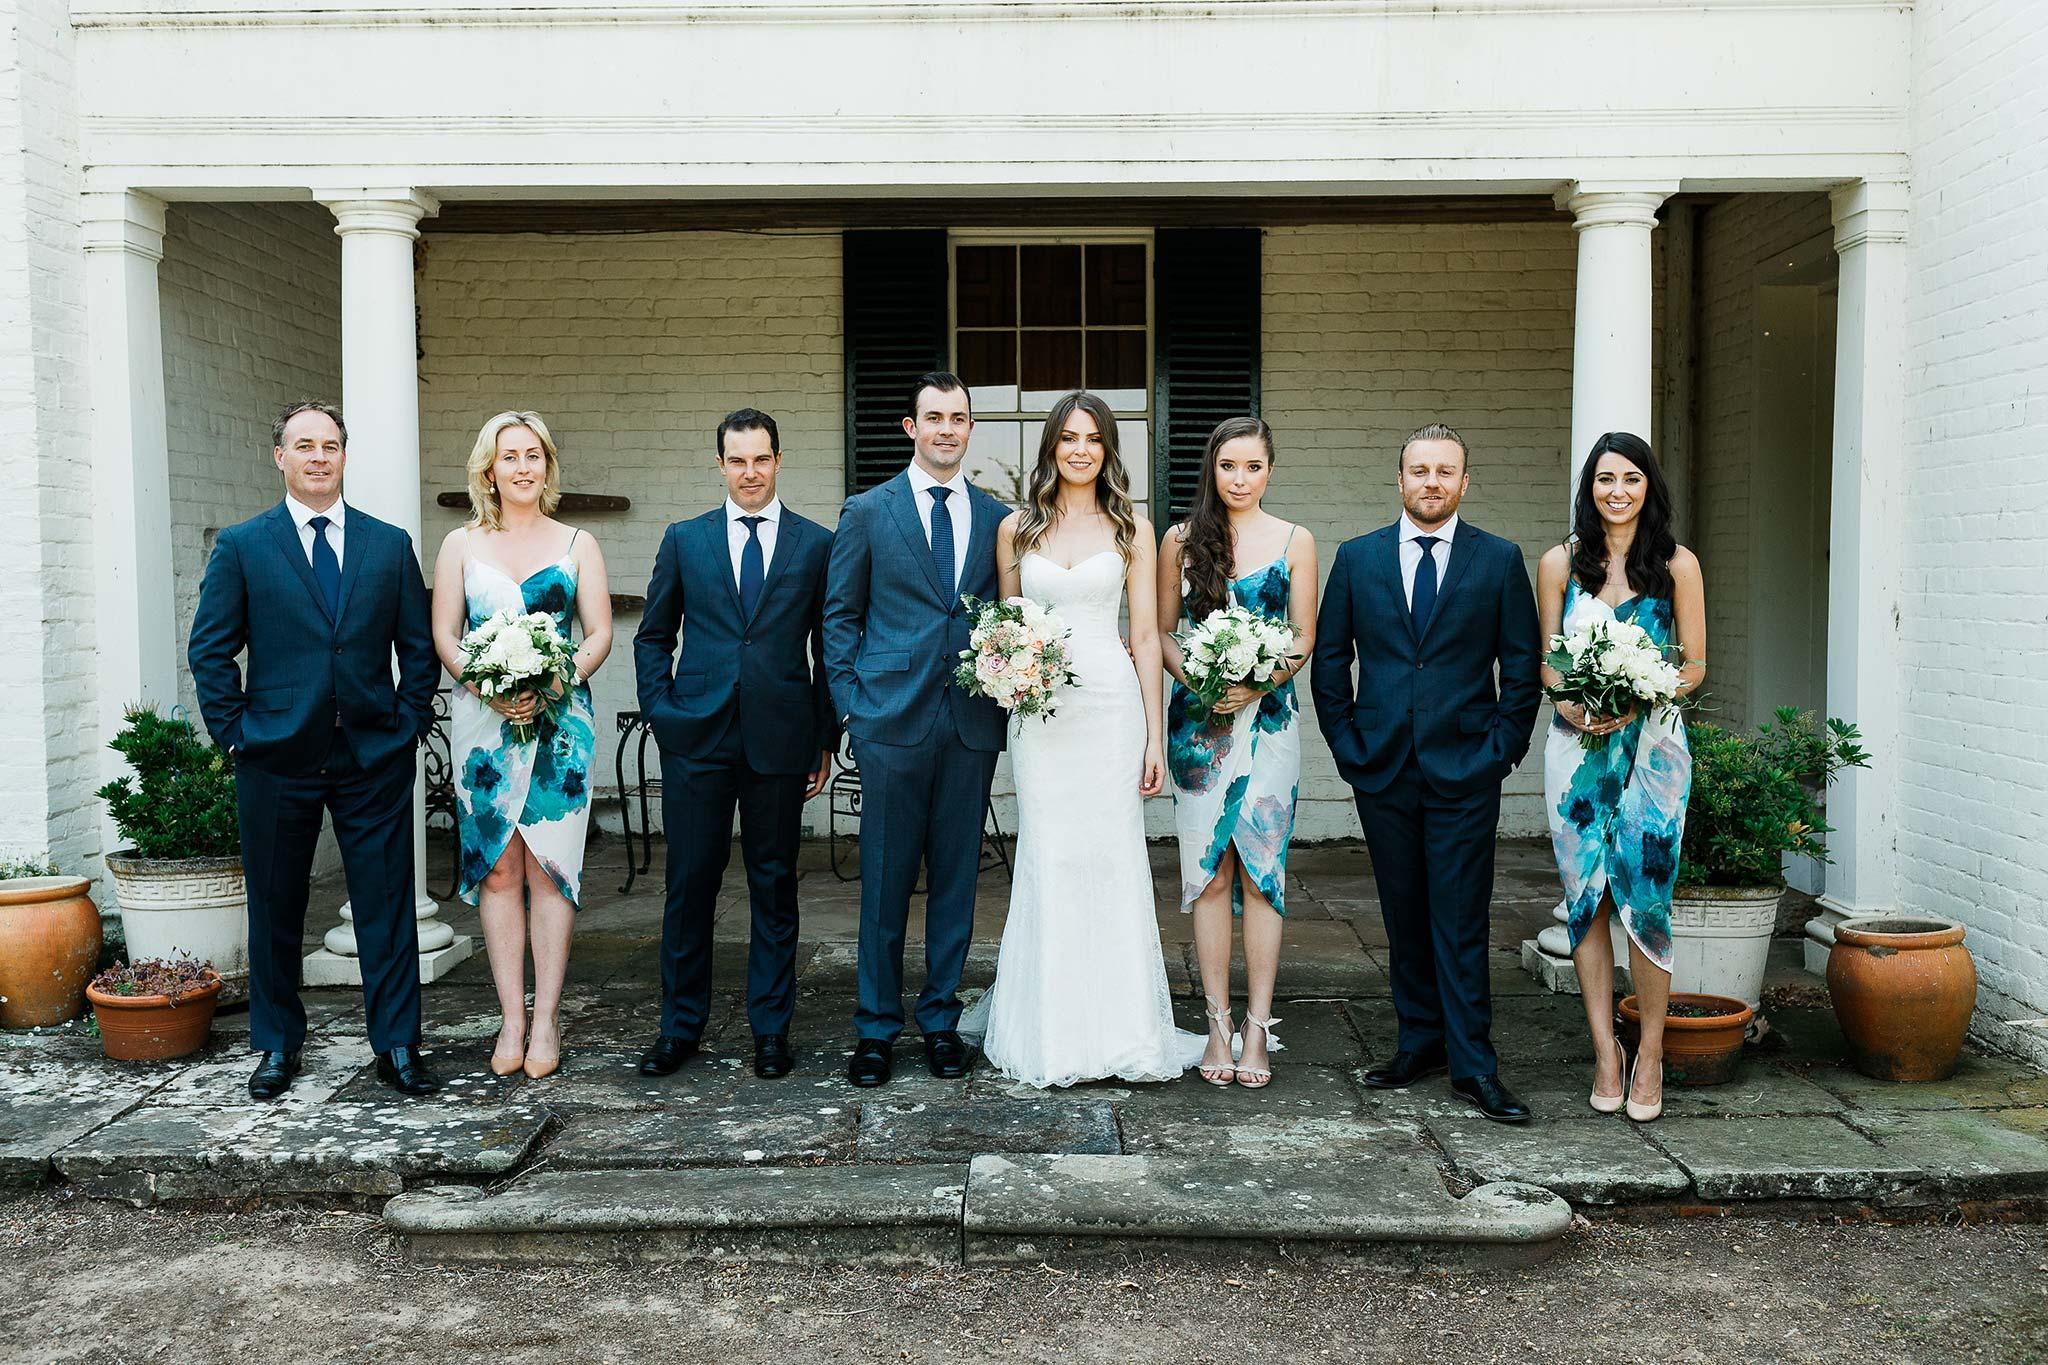 Bridal party at Brickendon homestead